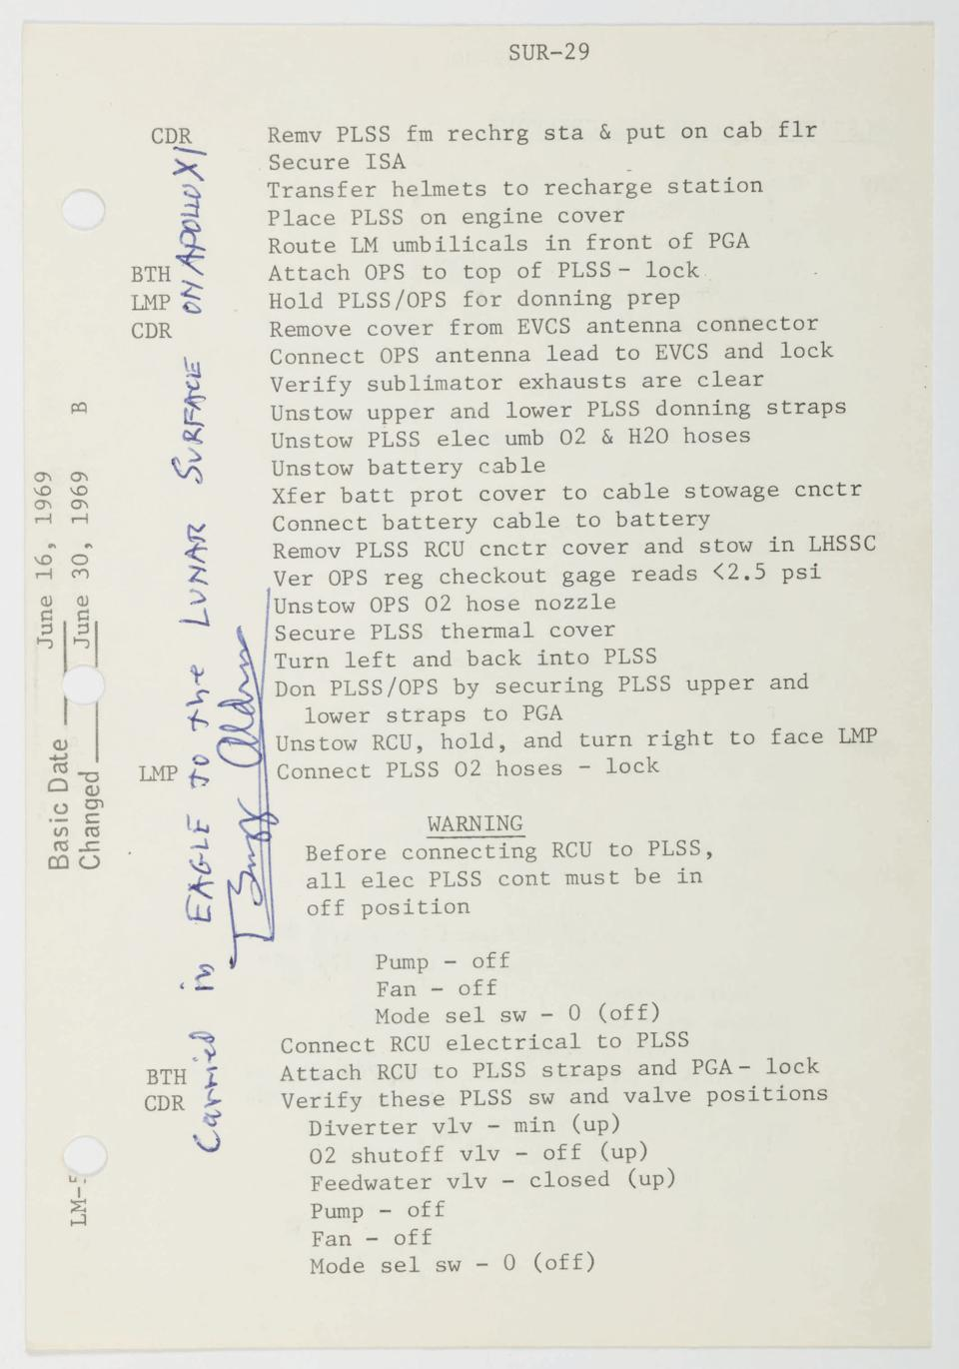 flown Apollo 11 checklist